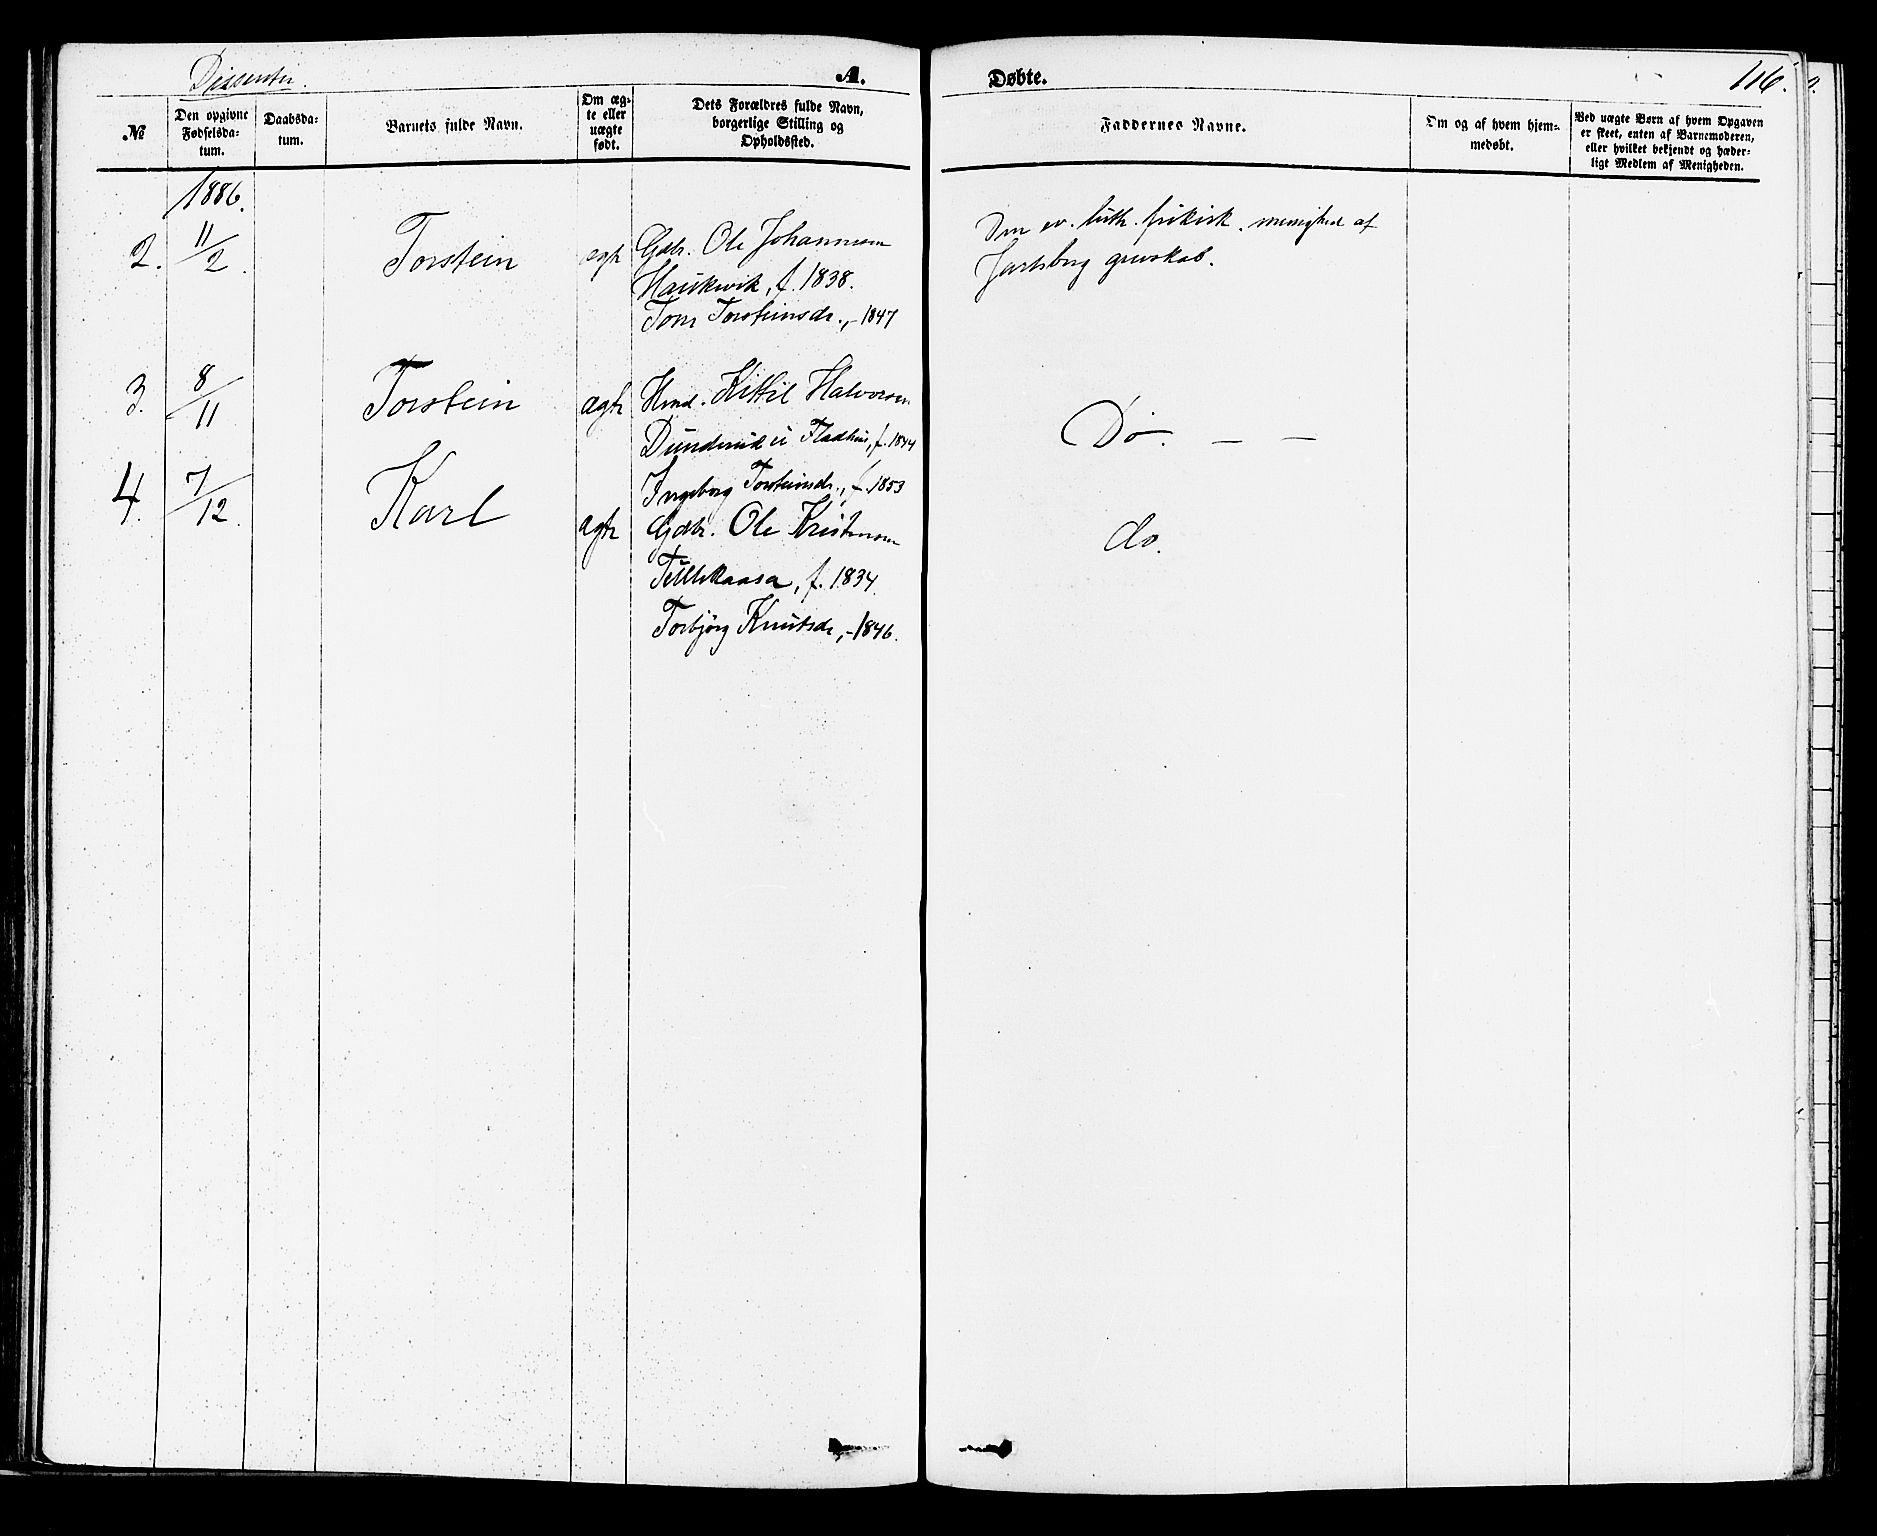 SAKO, Sauherad kirkebøker, F/Fa/L0008: Ministerialbok nr. I 8, 1873-1886, s. 116